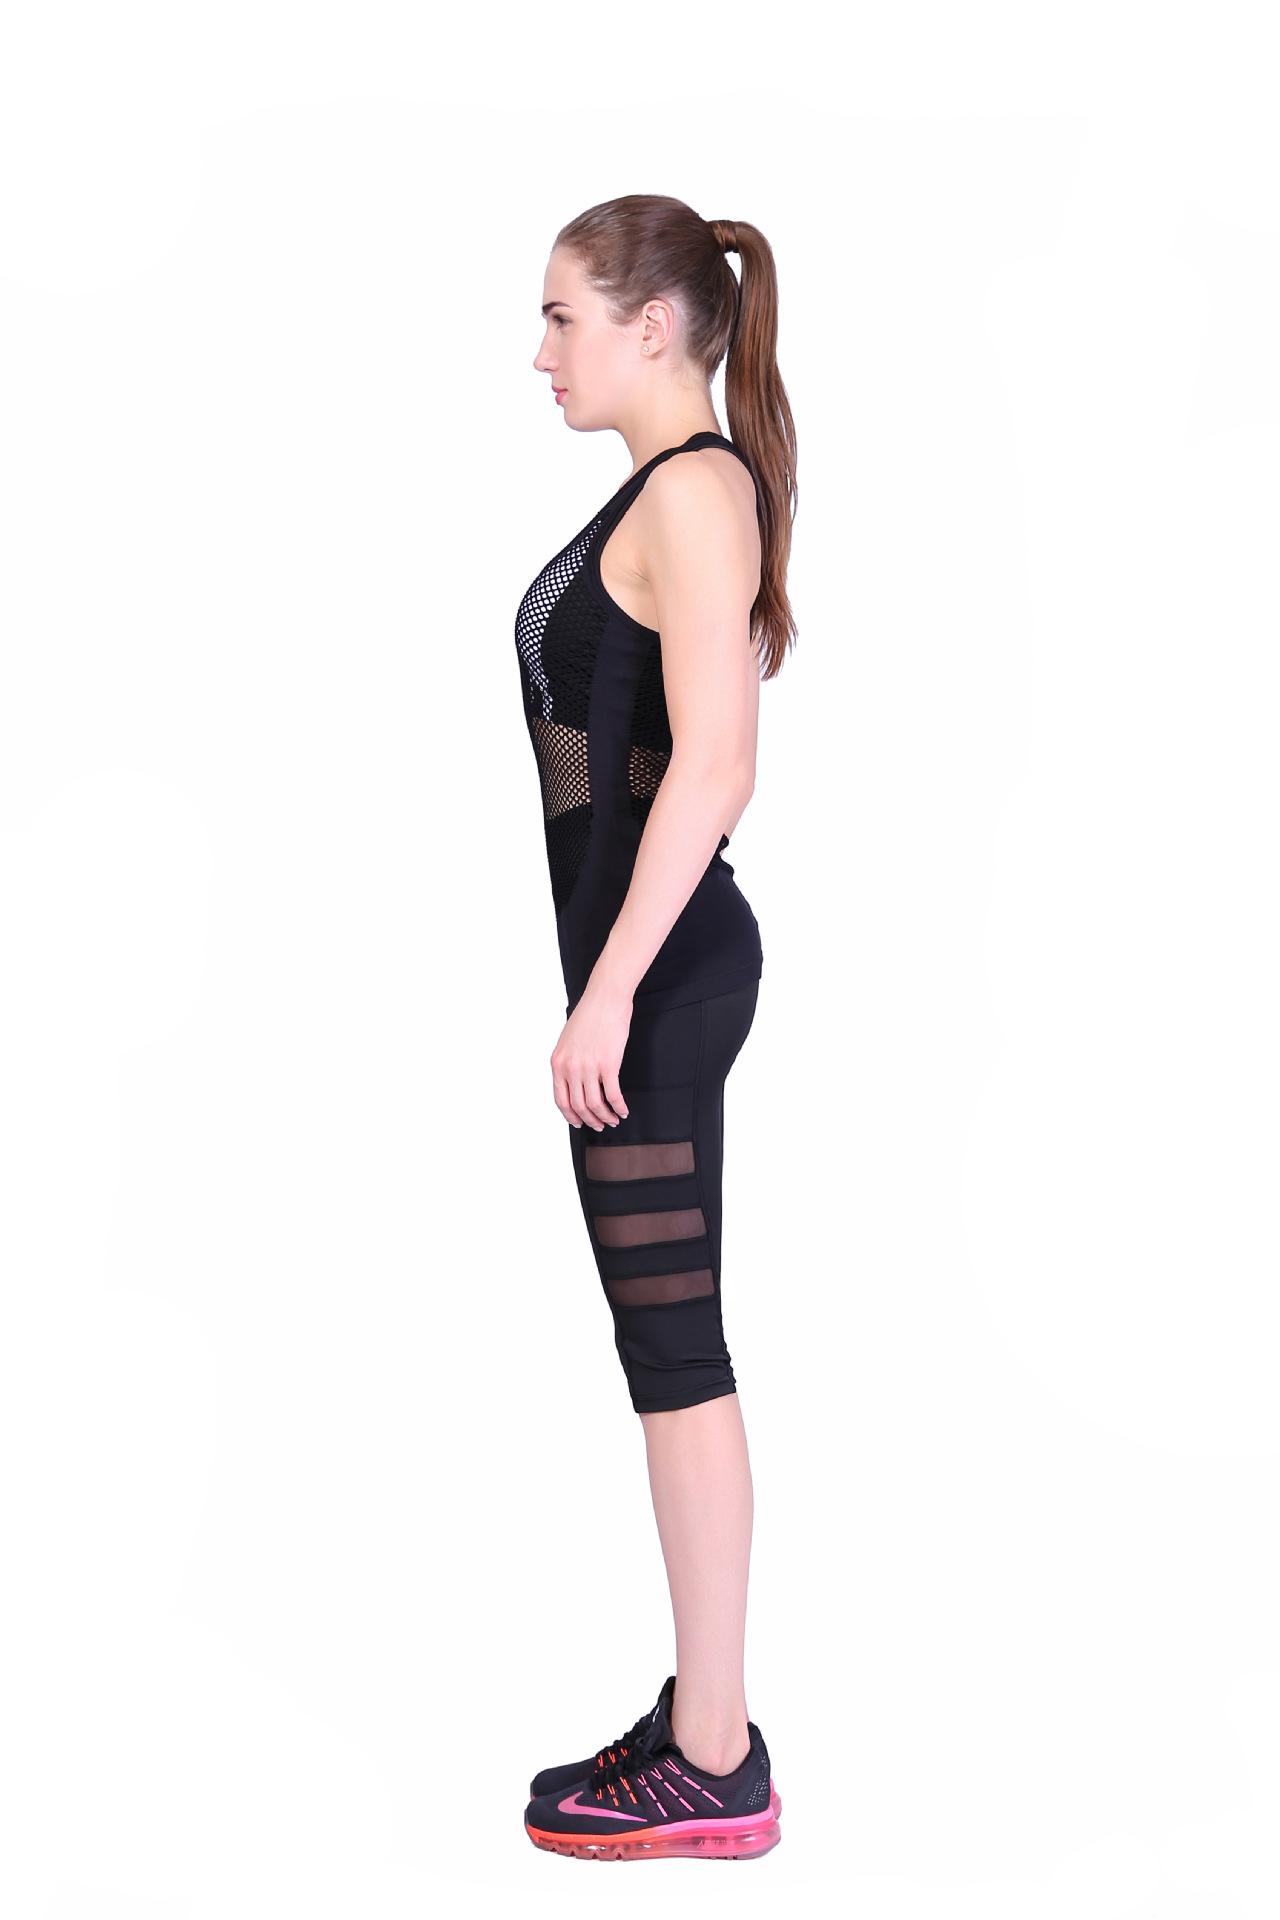 Women power stretch bottom mesh striped running workout yoga pants